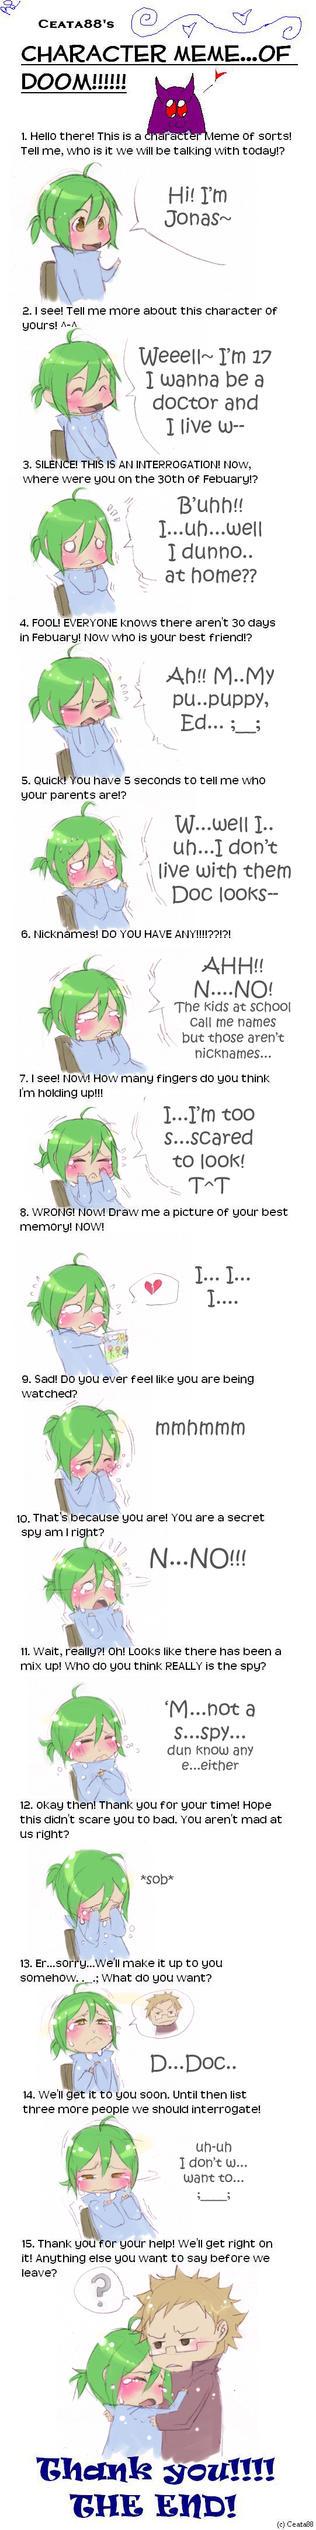 Moukemono: Interrogation Meme by kitten-chan